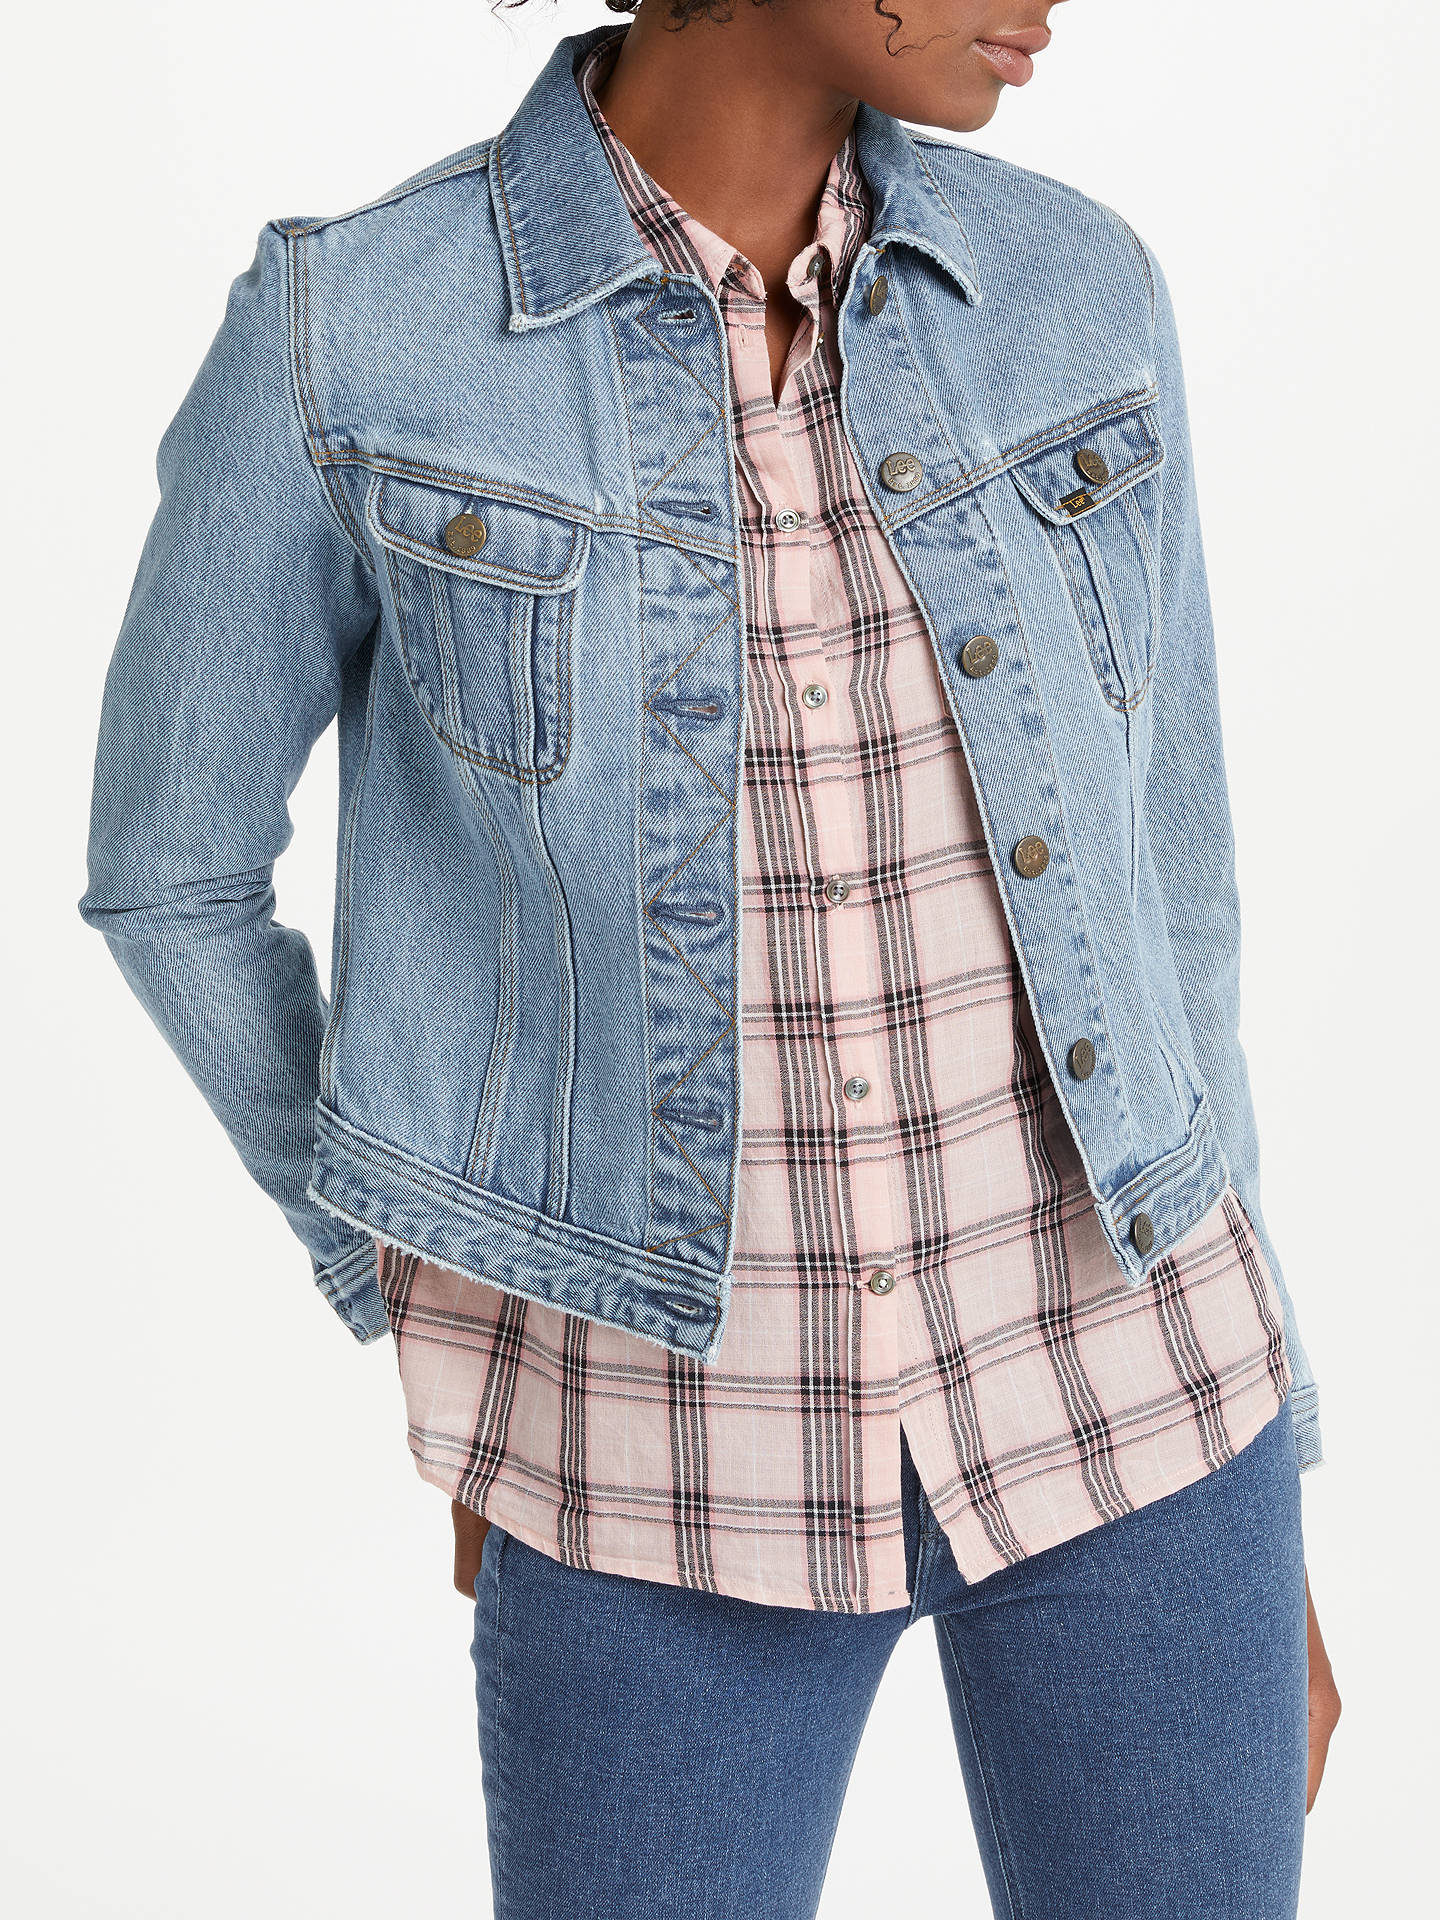 99bf5999 Buy Lee Slim Rider Denim Jacket, Super Stonewash, XS Online at  johnlewis.com ...